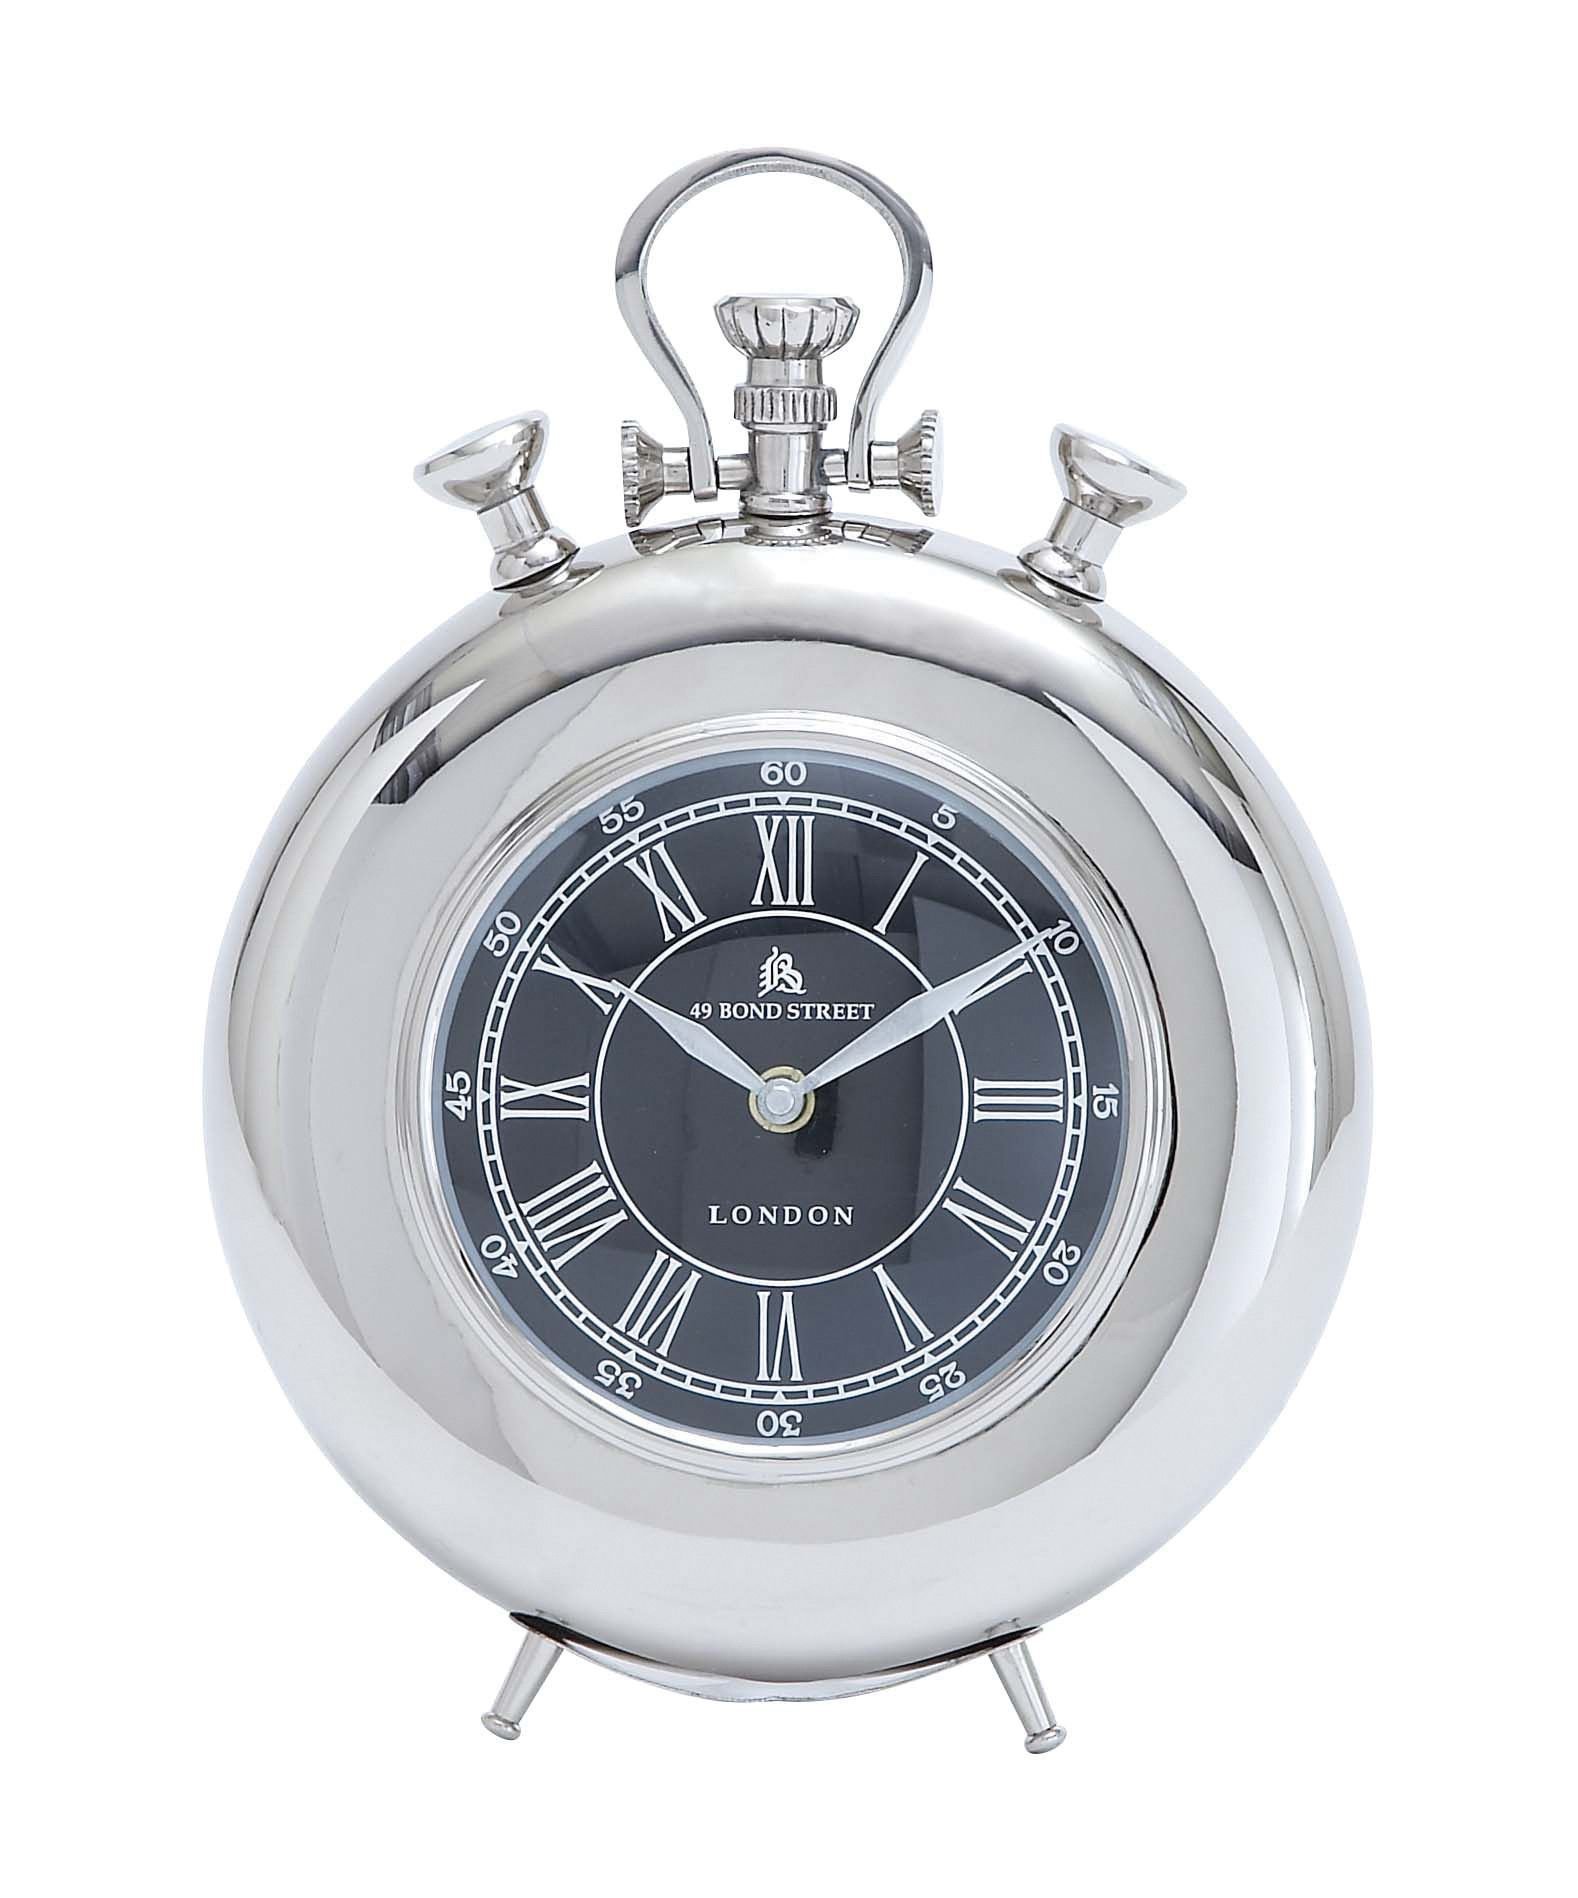 Creative clock background  Harvey u Haley Nickel Plated Table Clock with Roman Numerals